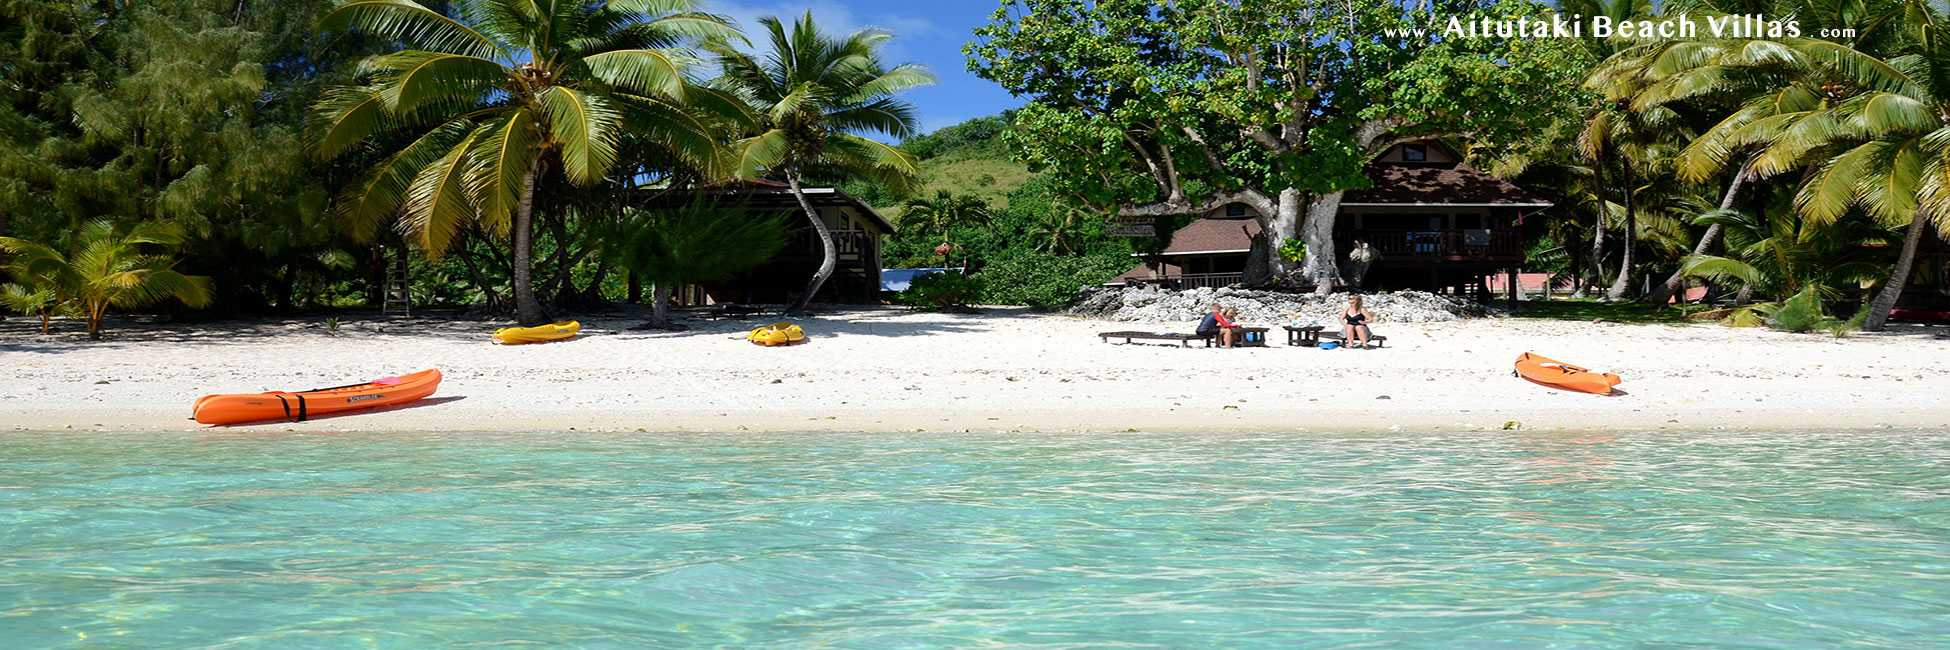 Aitutaki Beach Villas Affordable